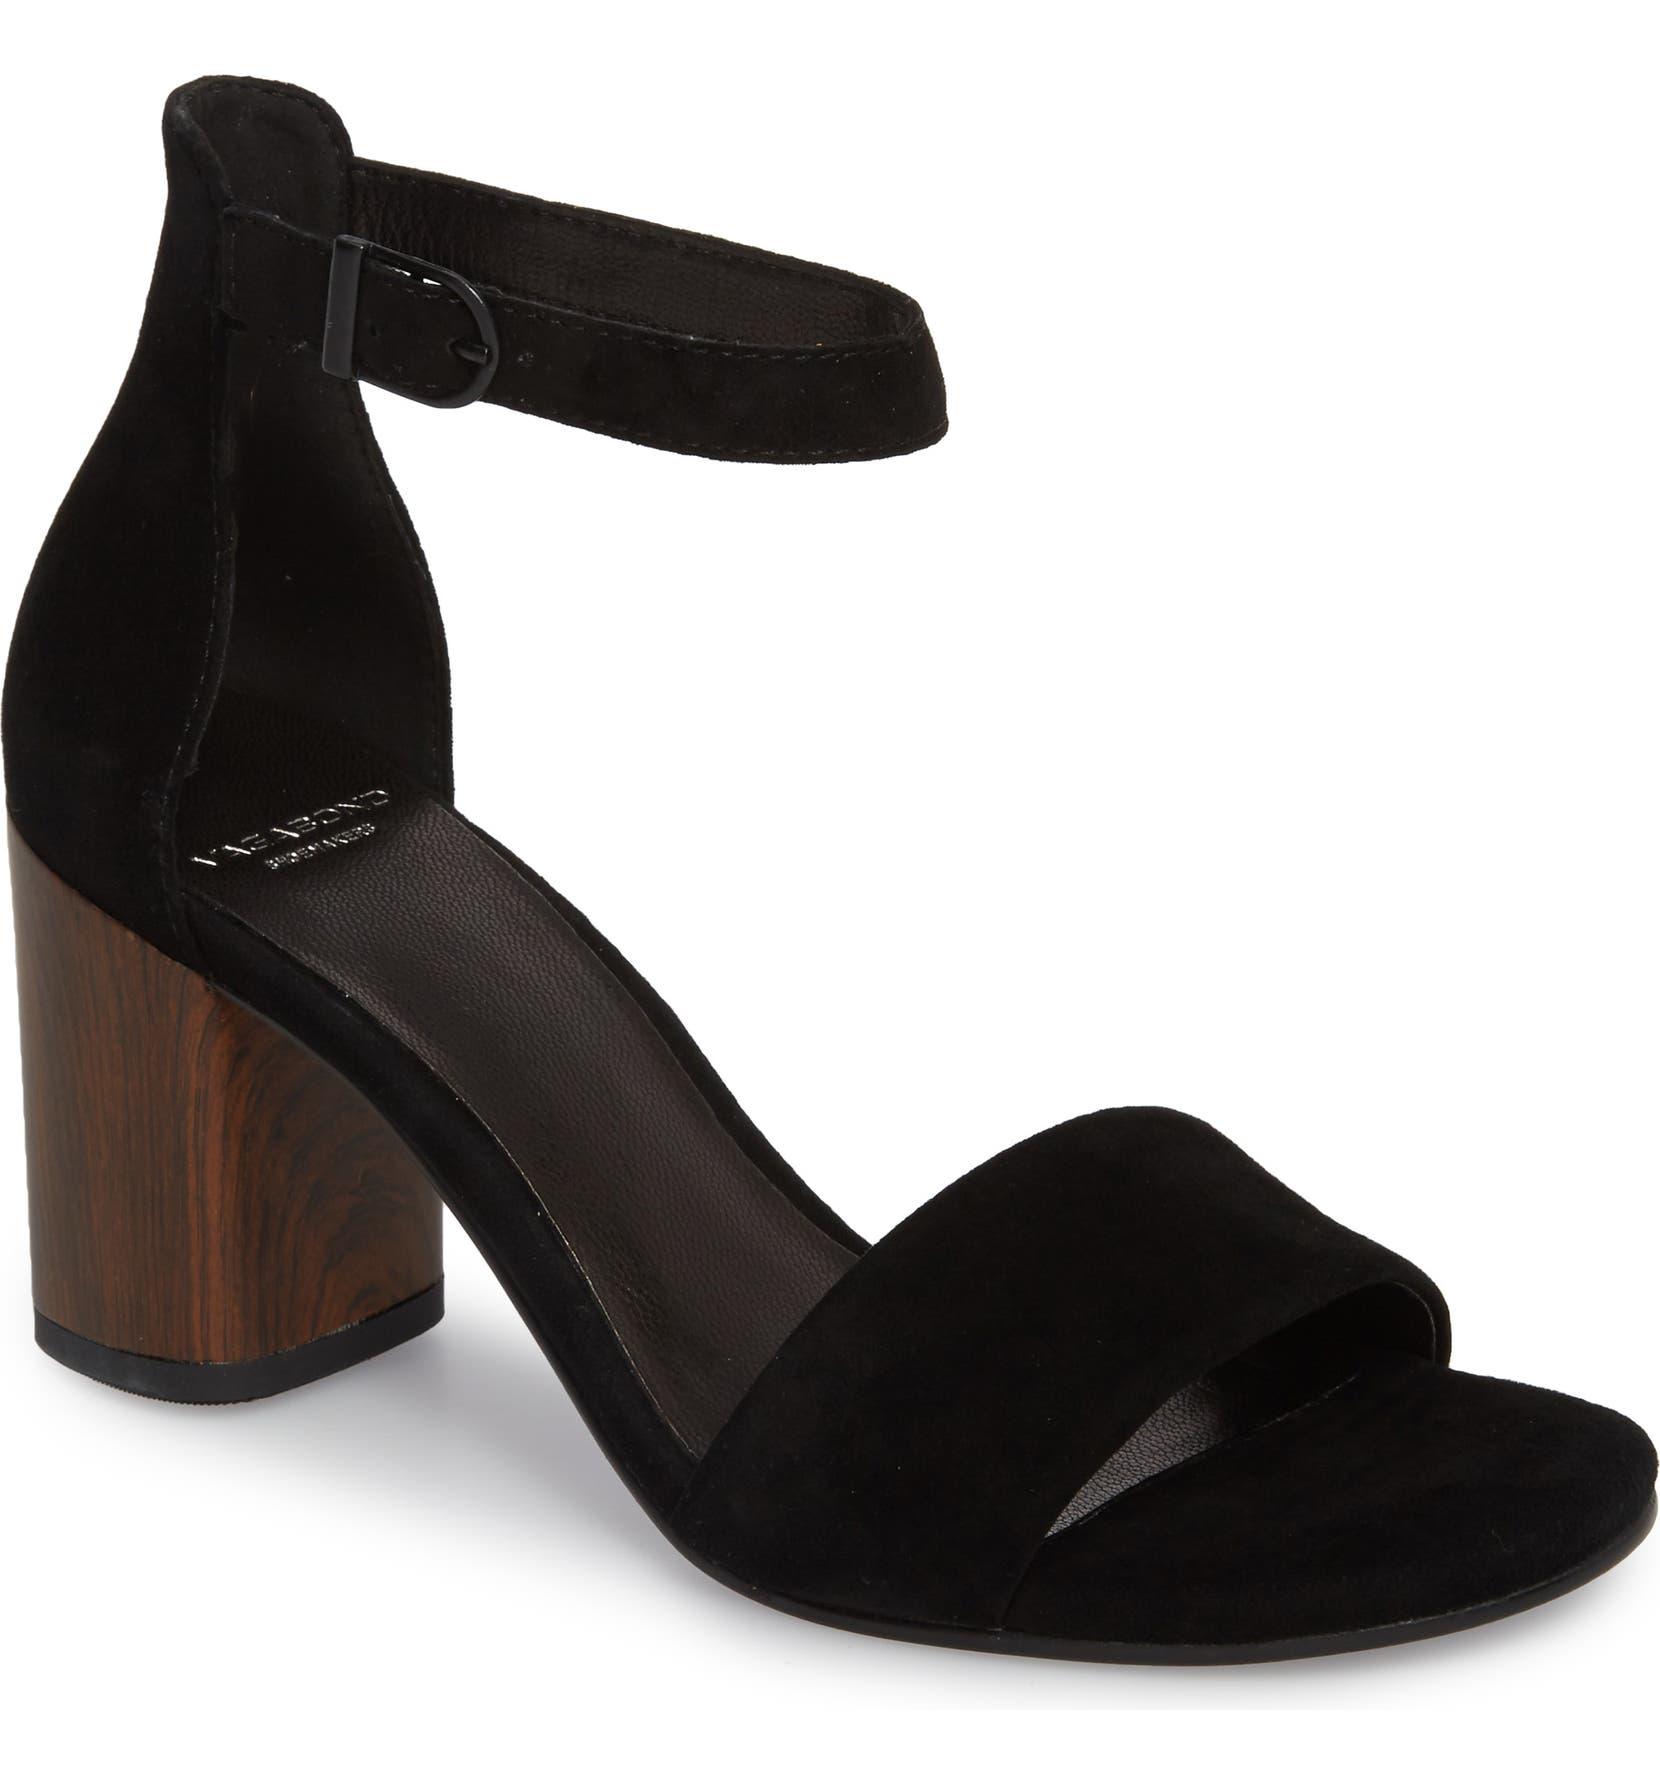 dac568a90ba Vagabond Shoemakers Carol Ankle Strap Sandal (Women)   Nordstrom